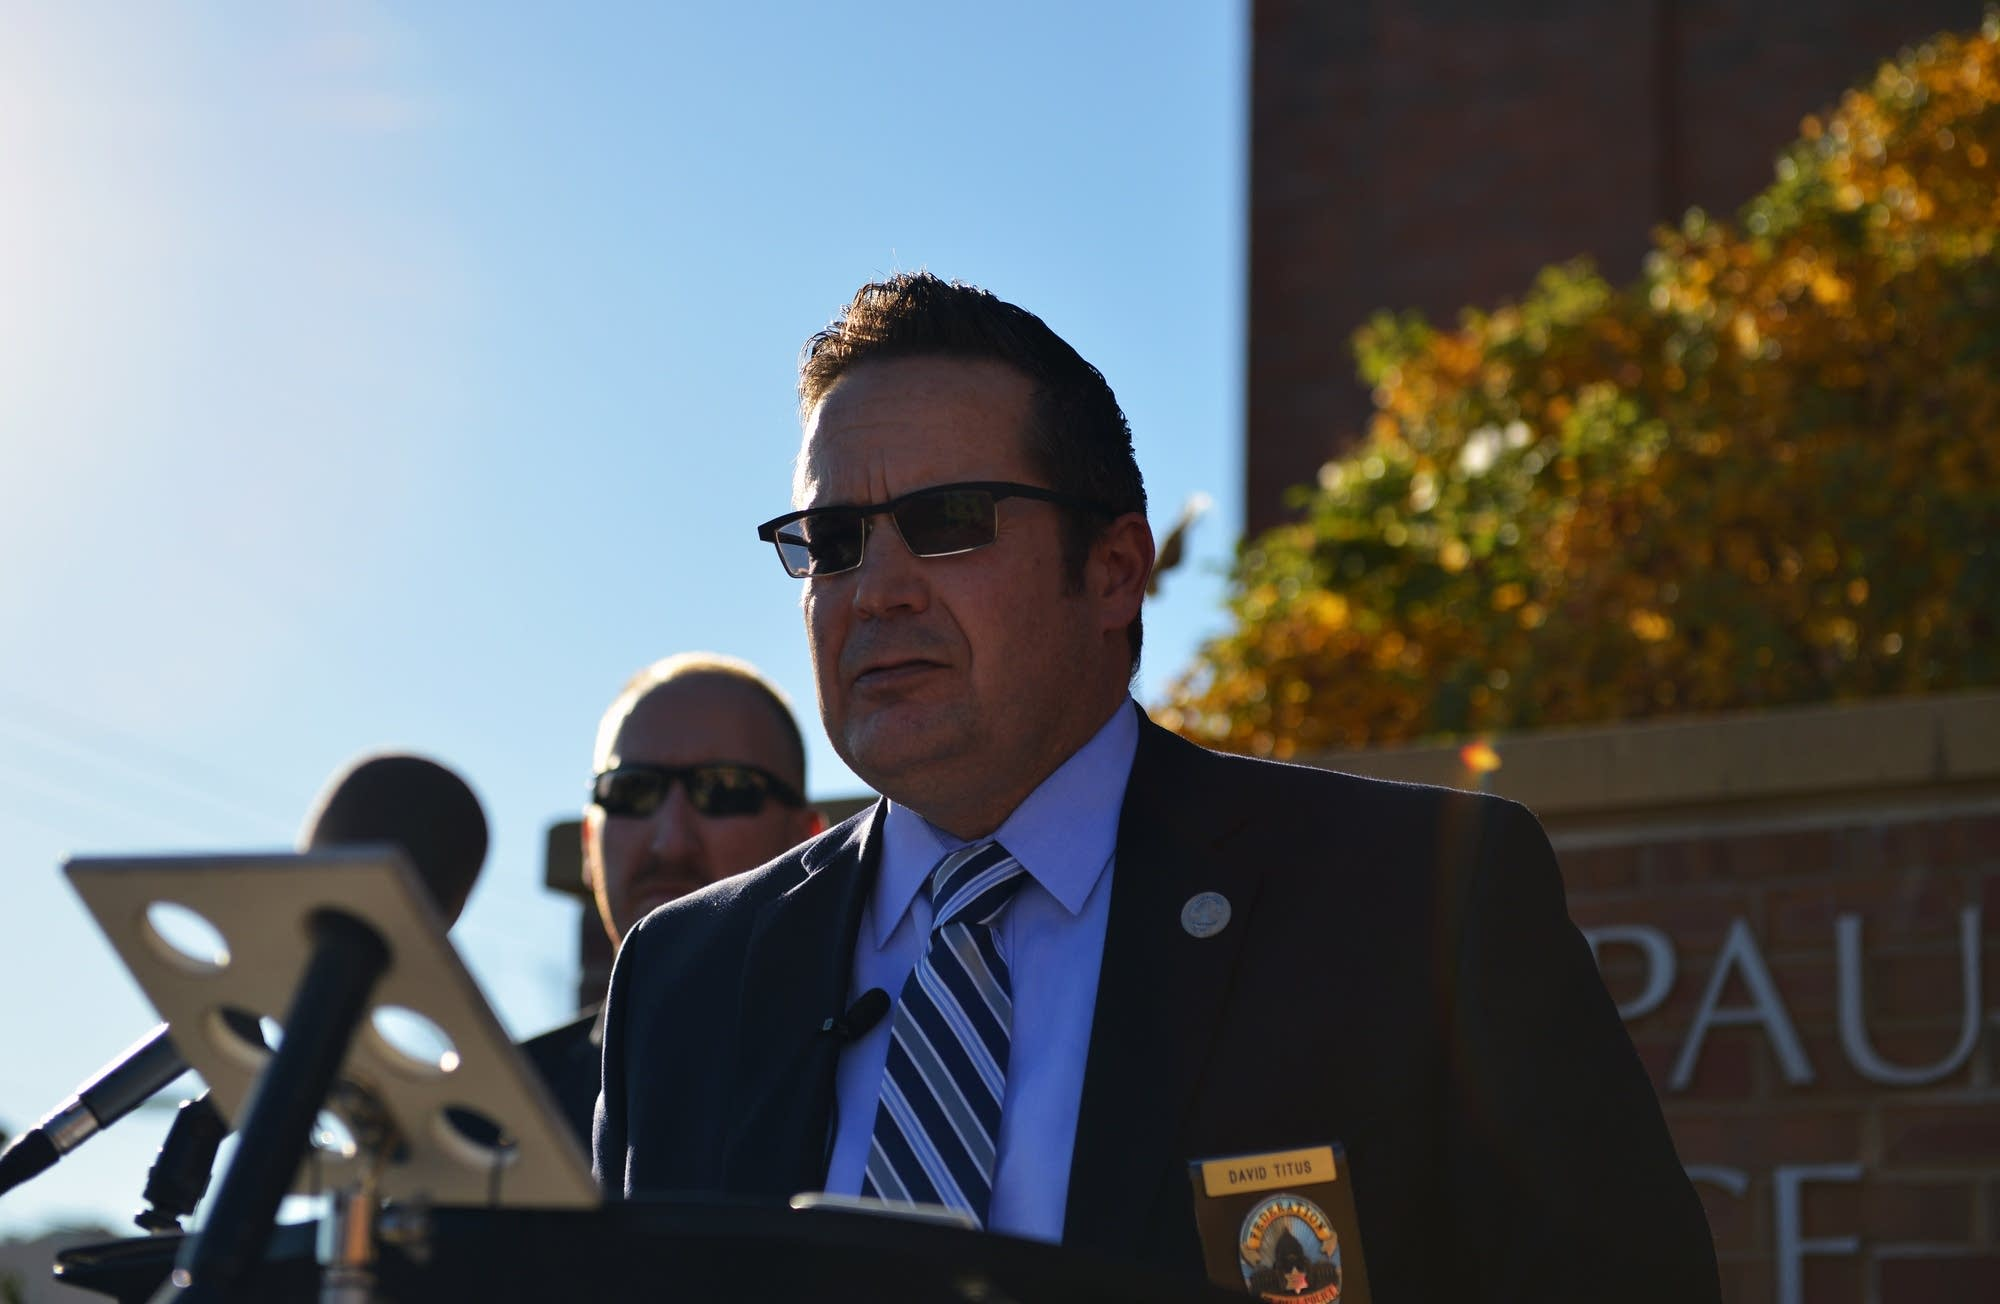 St.Paul Police Federation President David Titus.